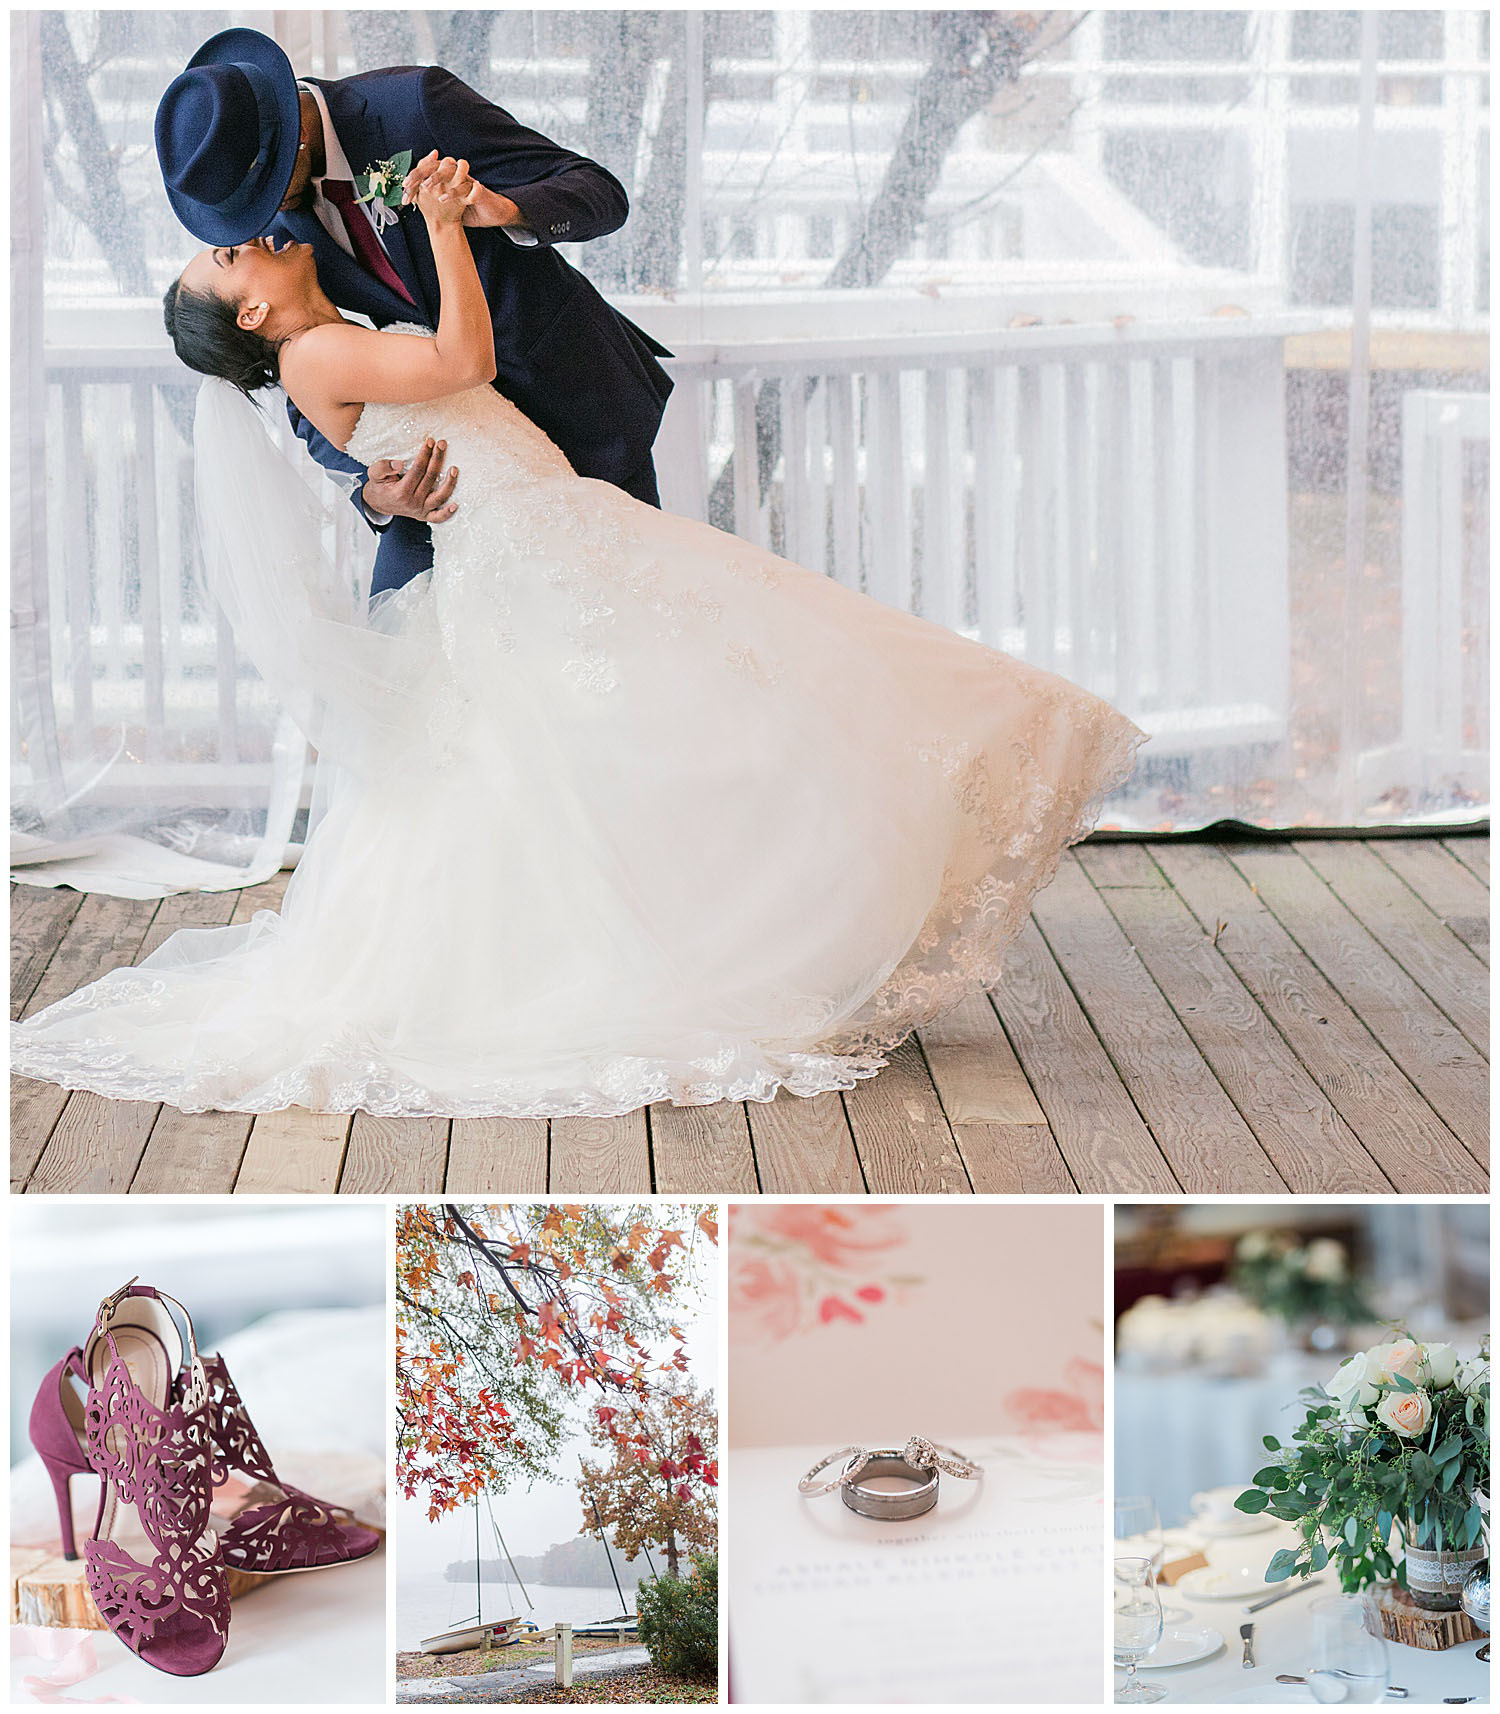 Boathouse Wedding - Richmond Virginia - Ashale + Jordan